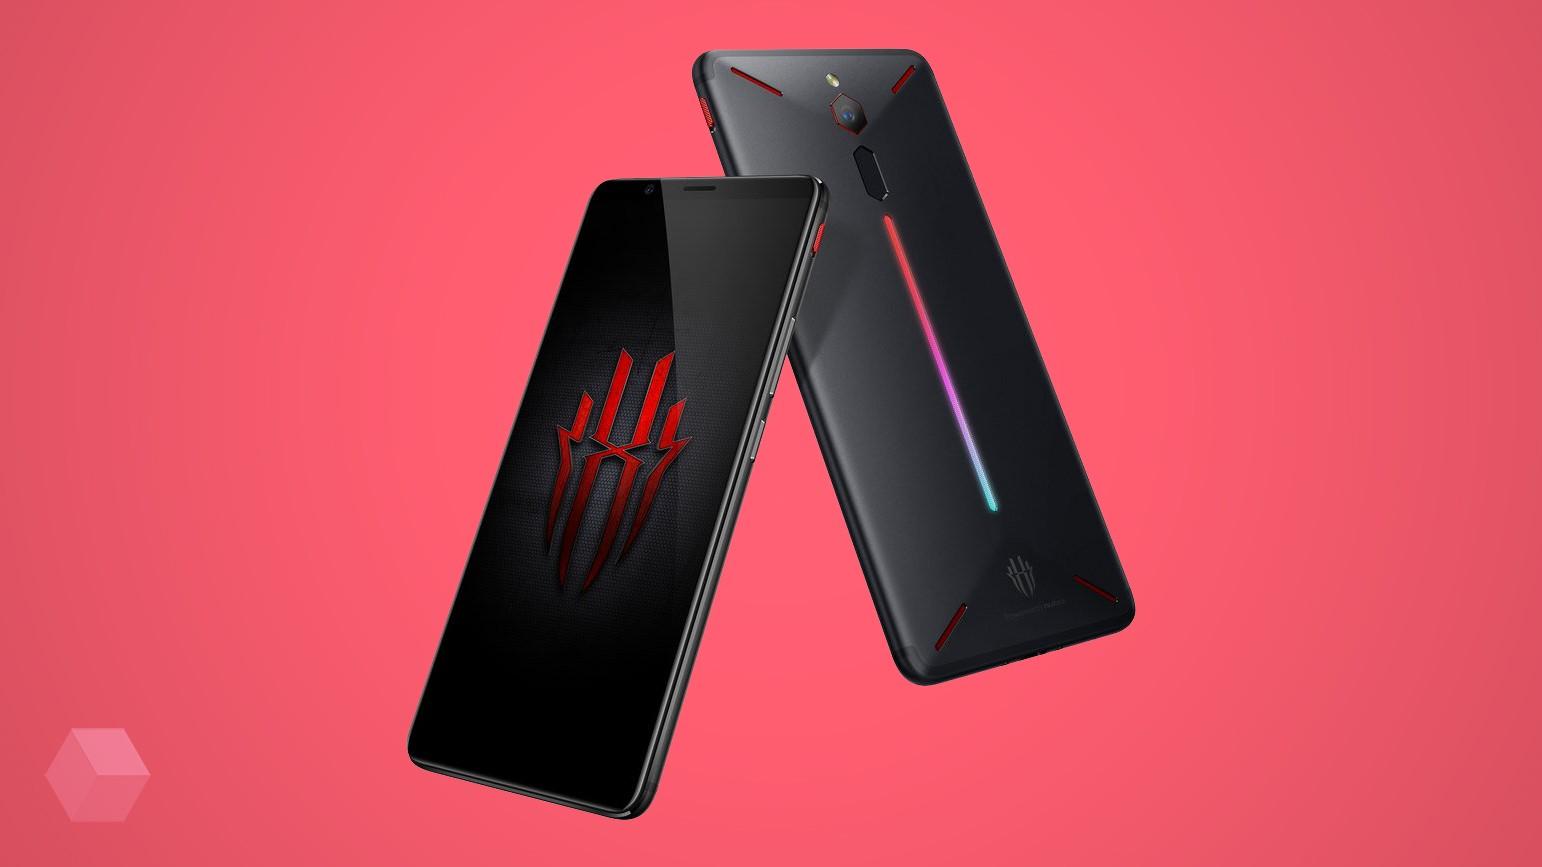 Nubia представила игровой смартфон Red Magic